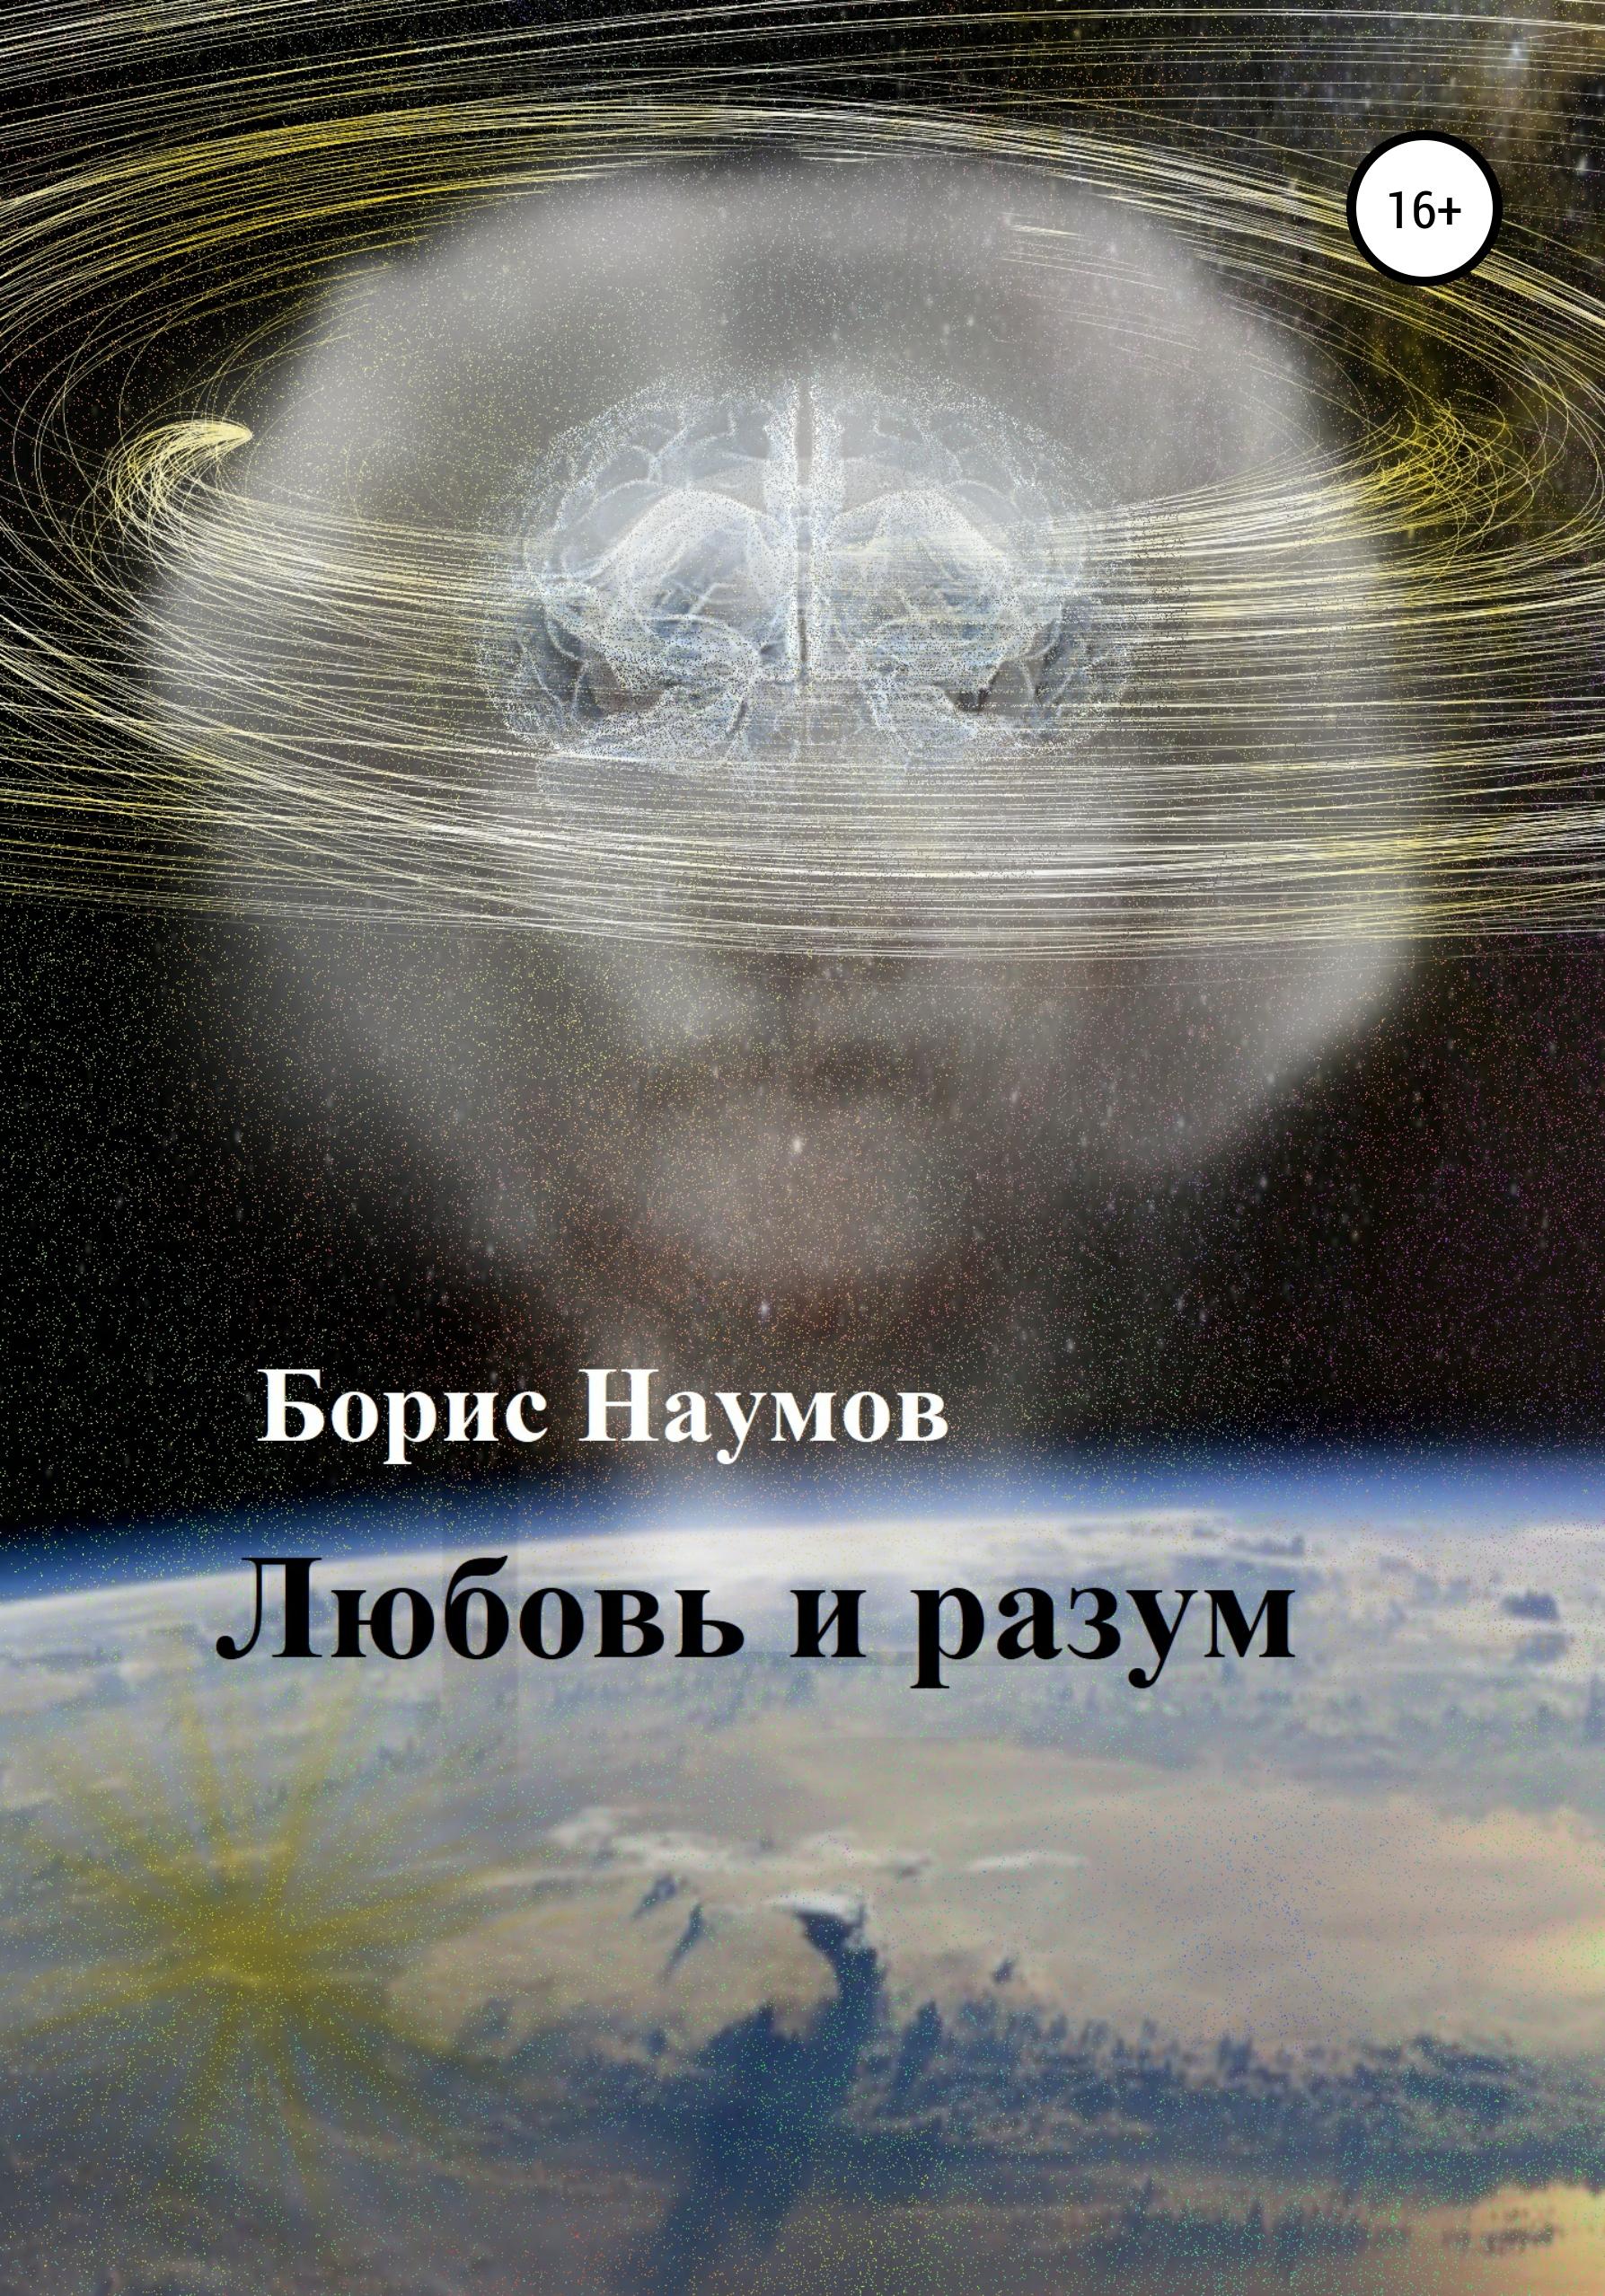 Борис Петрович Наумов Любовь и Разум борис петрович наумов только разум